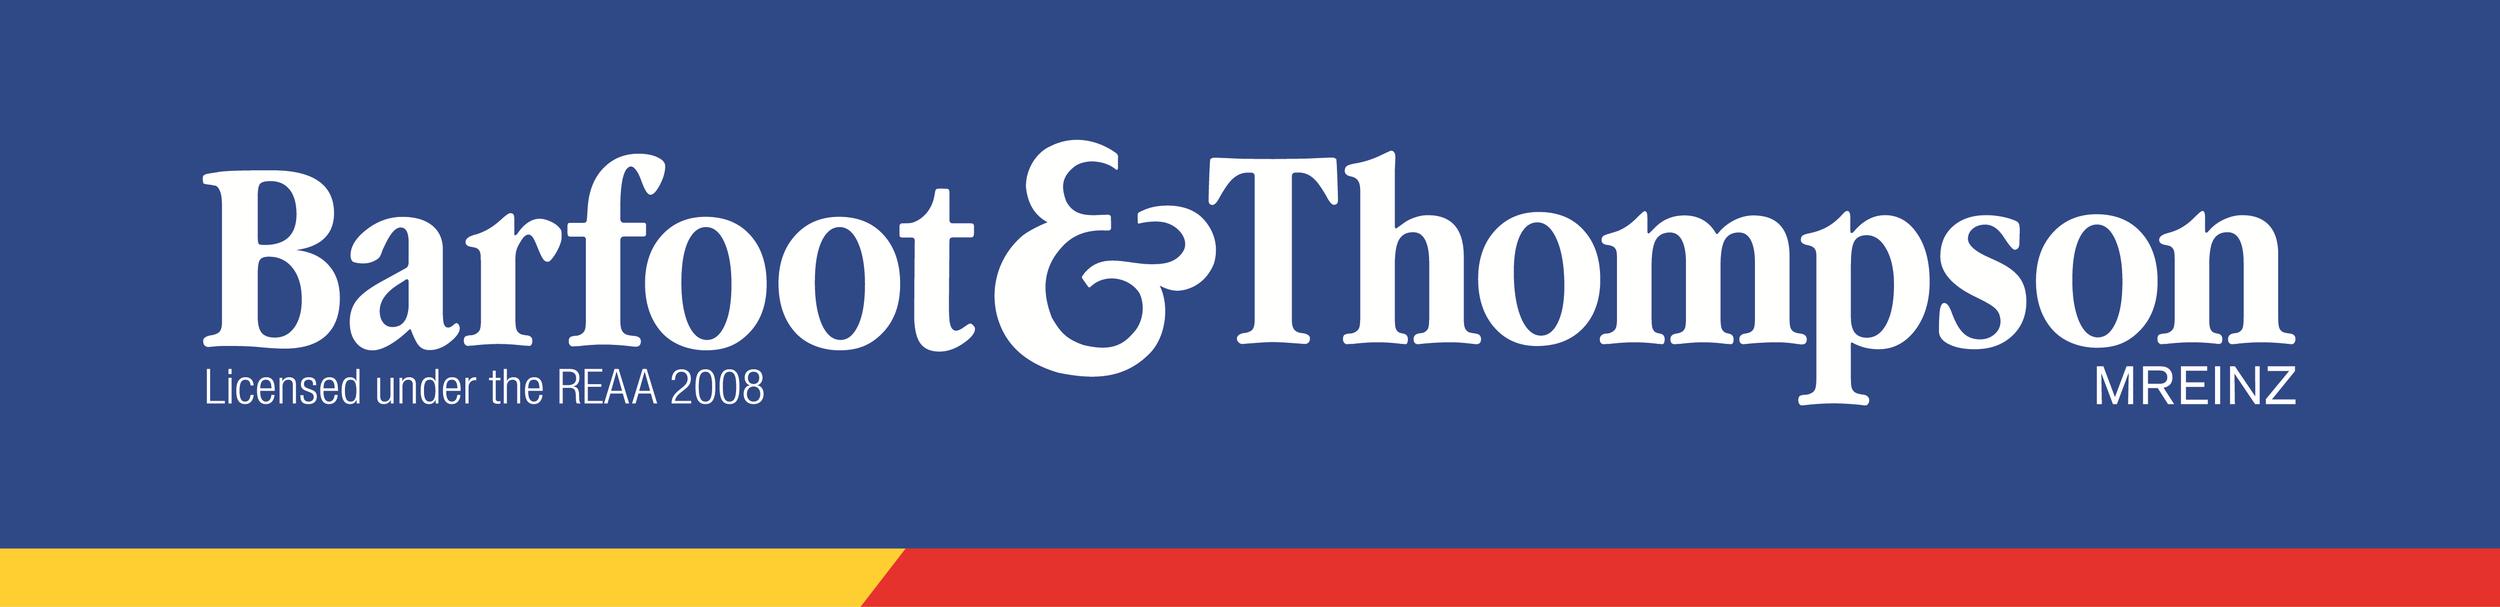 Barfoot & Thompson Logo.png